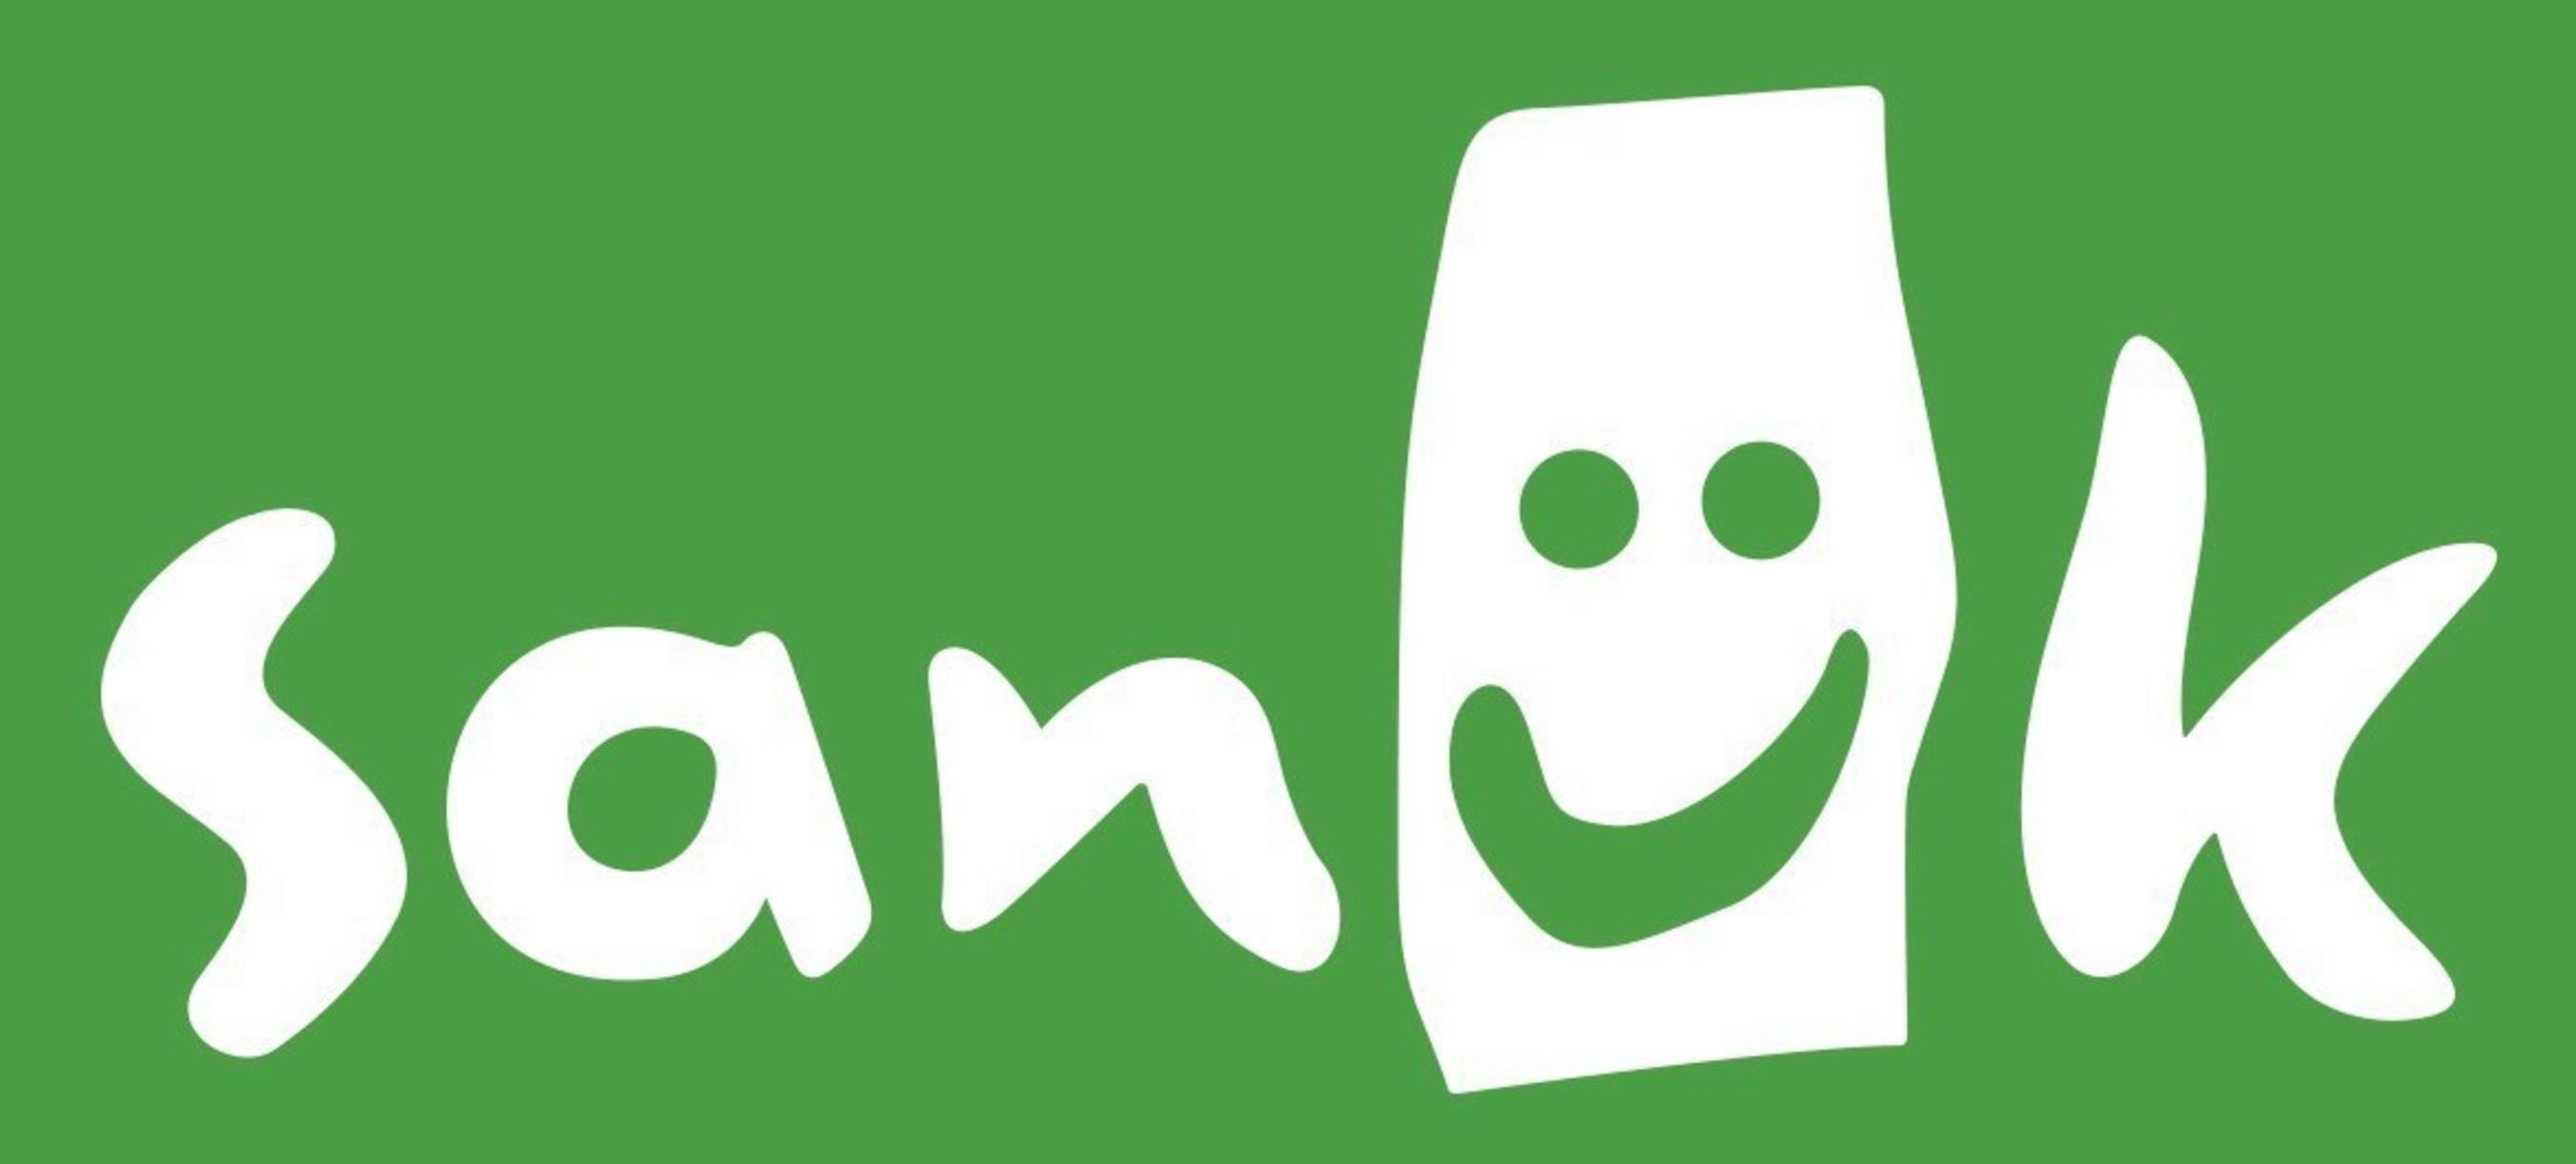 https://0901.nccdn.net/4_2/000/000/07f/5ee/Sanuk-logo-2700x1220.jpg